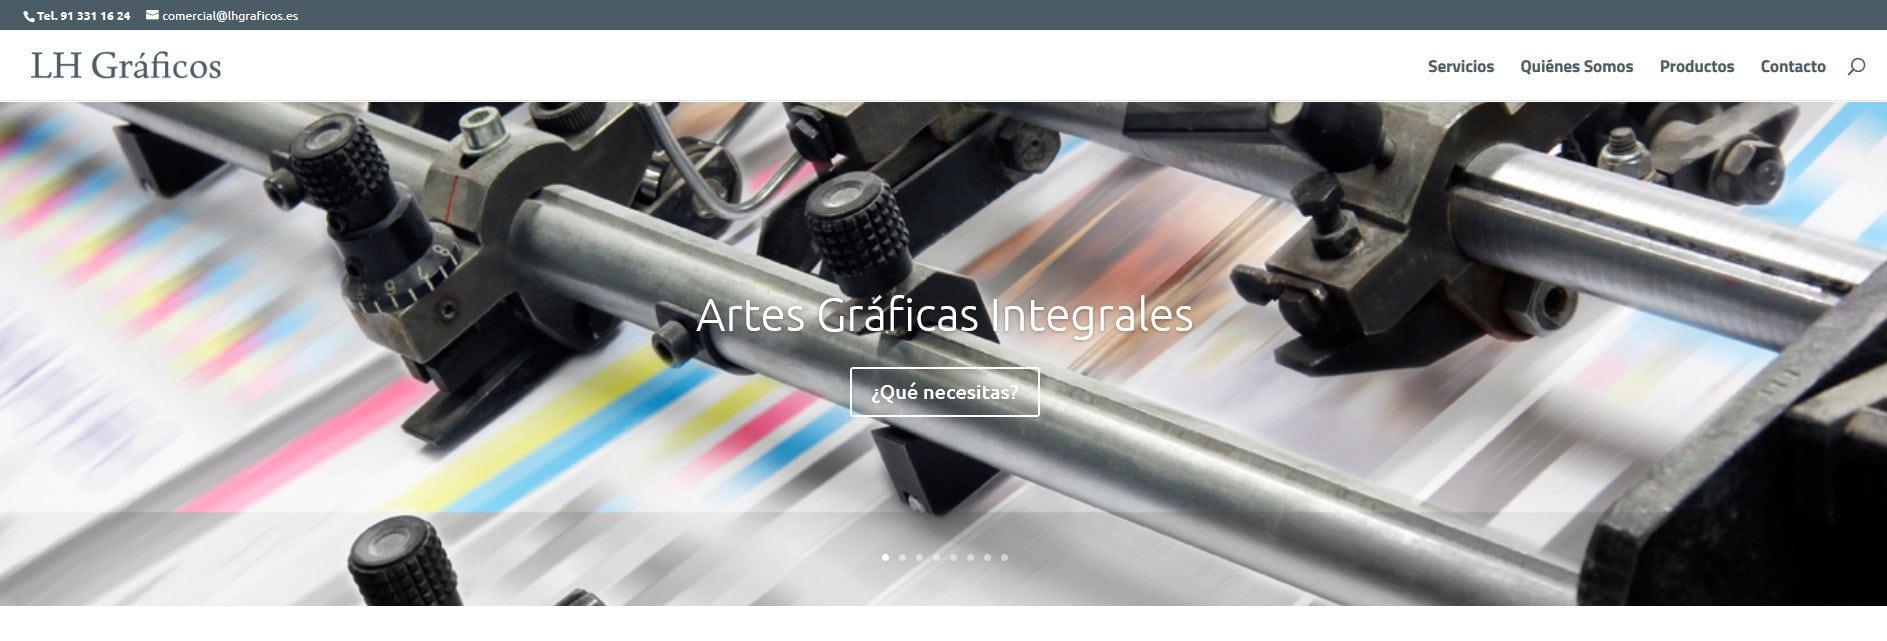 diseno web imprenta impresion Diseño paginas web